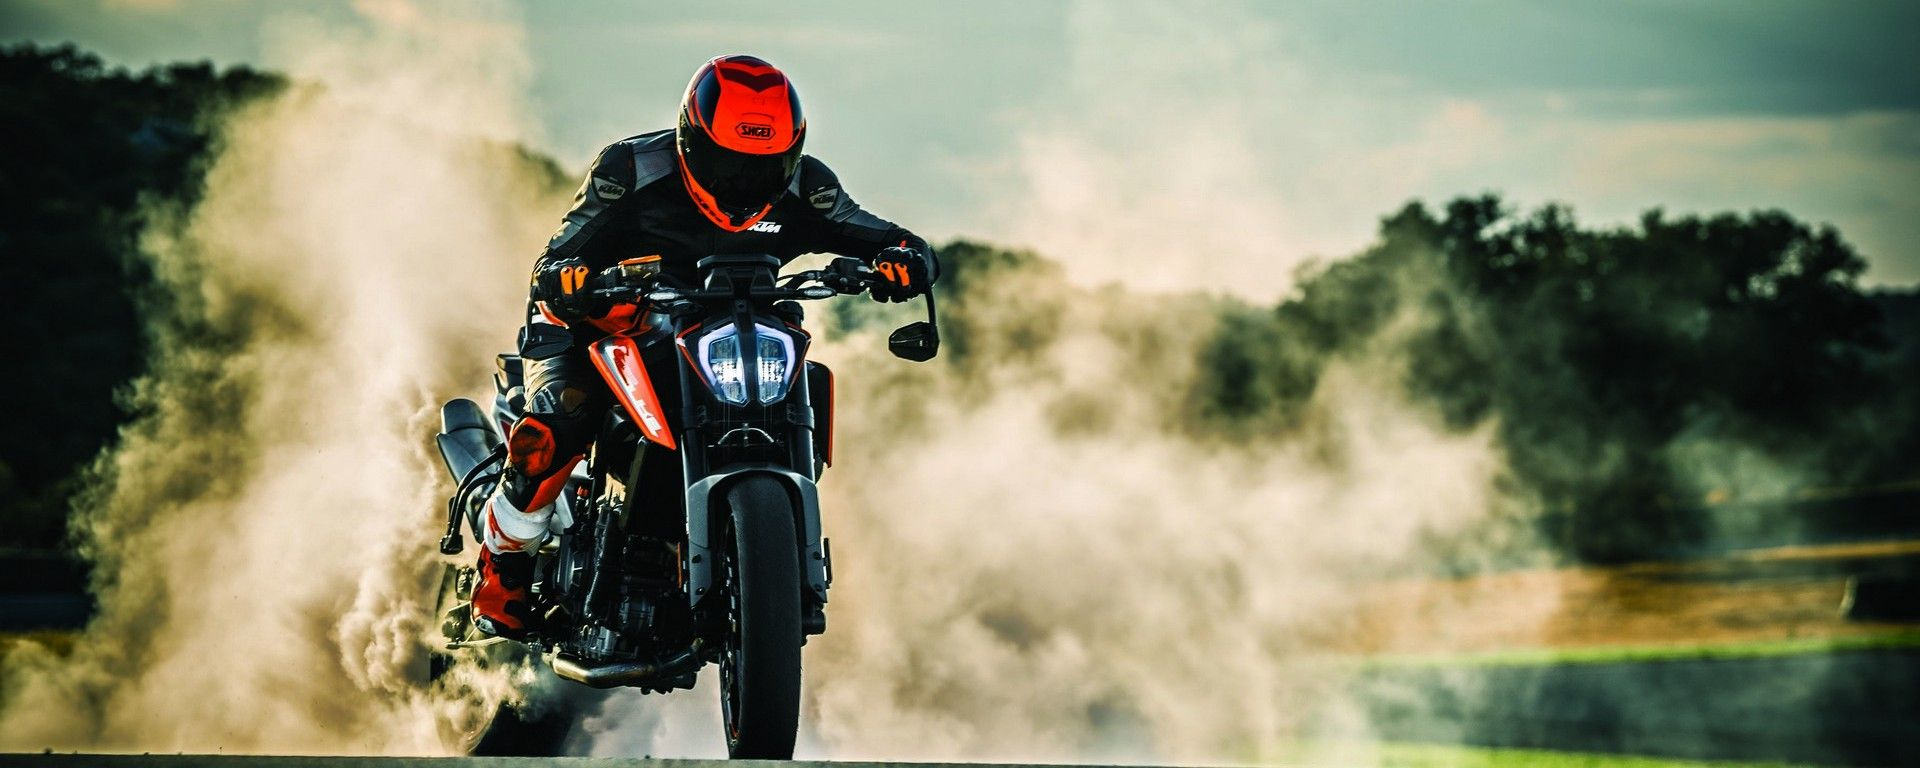 KTM sarà presente al Motor Bike Expo 2018